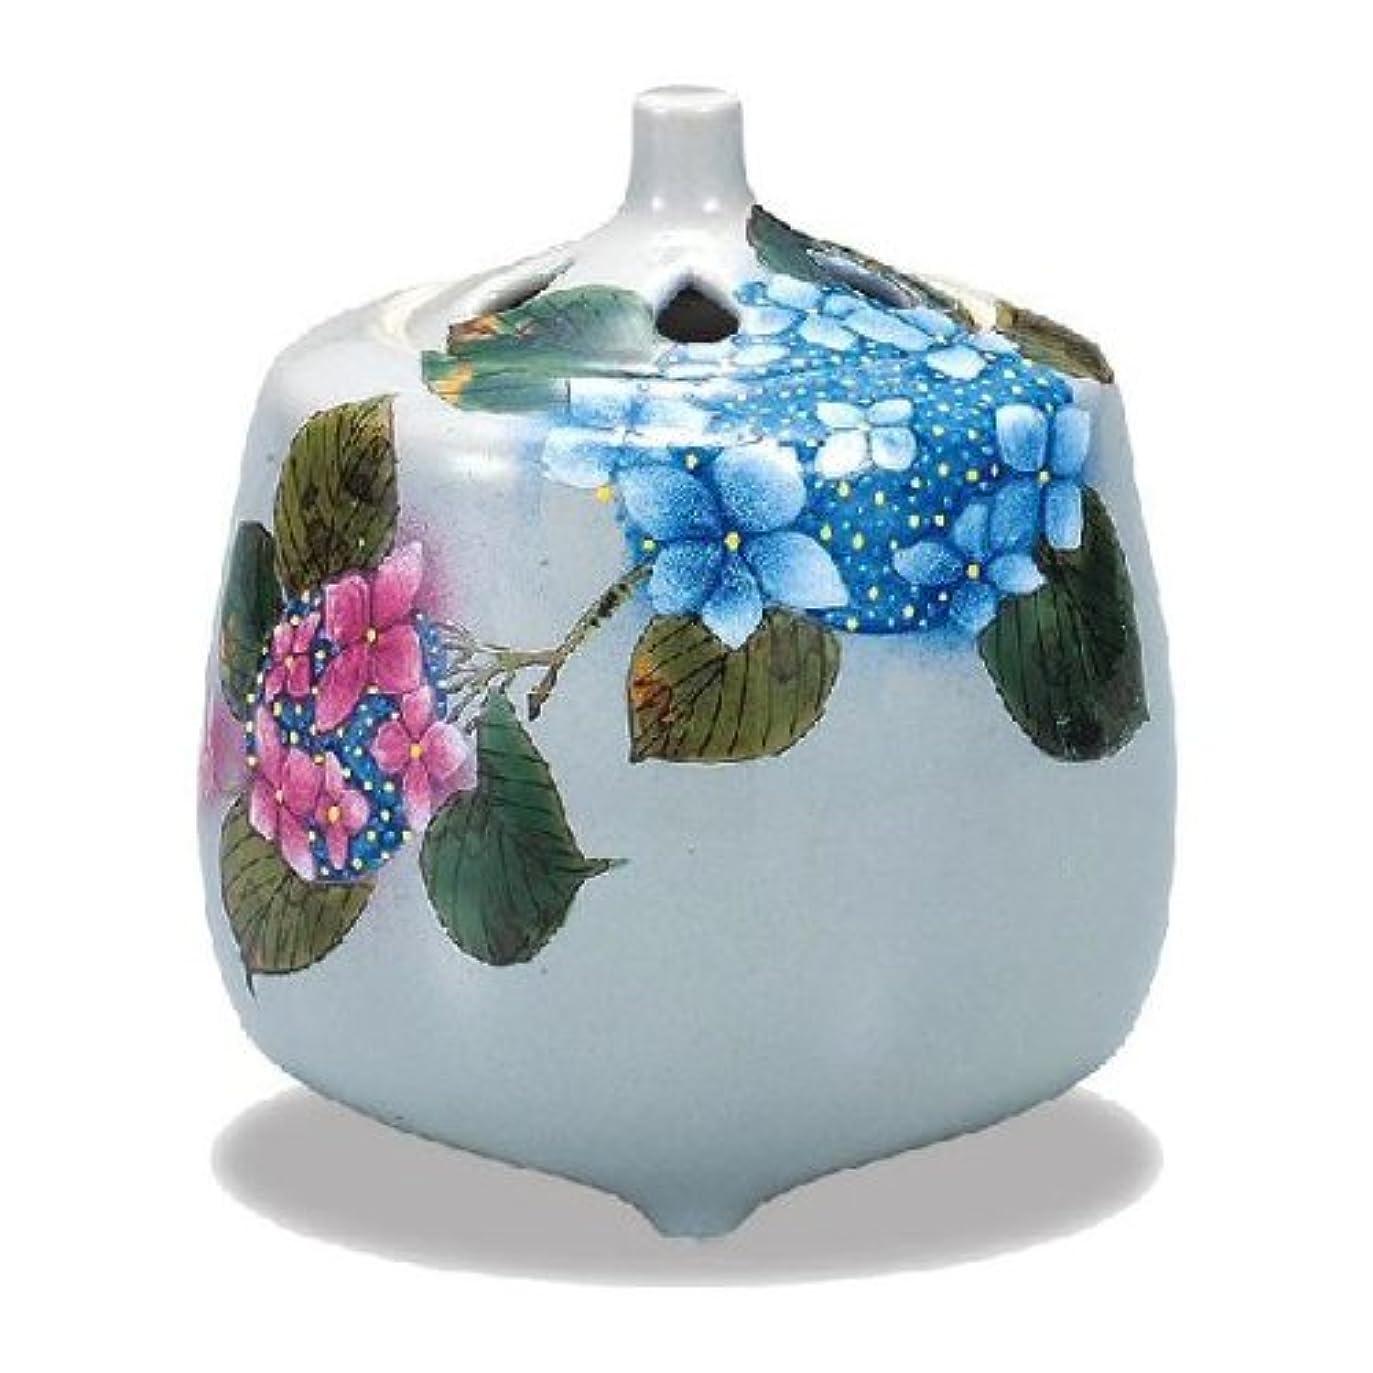 風百科事典ライド九谷焼香炉(紫陽花)